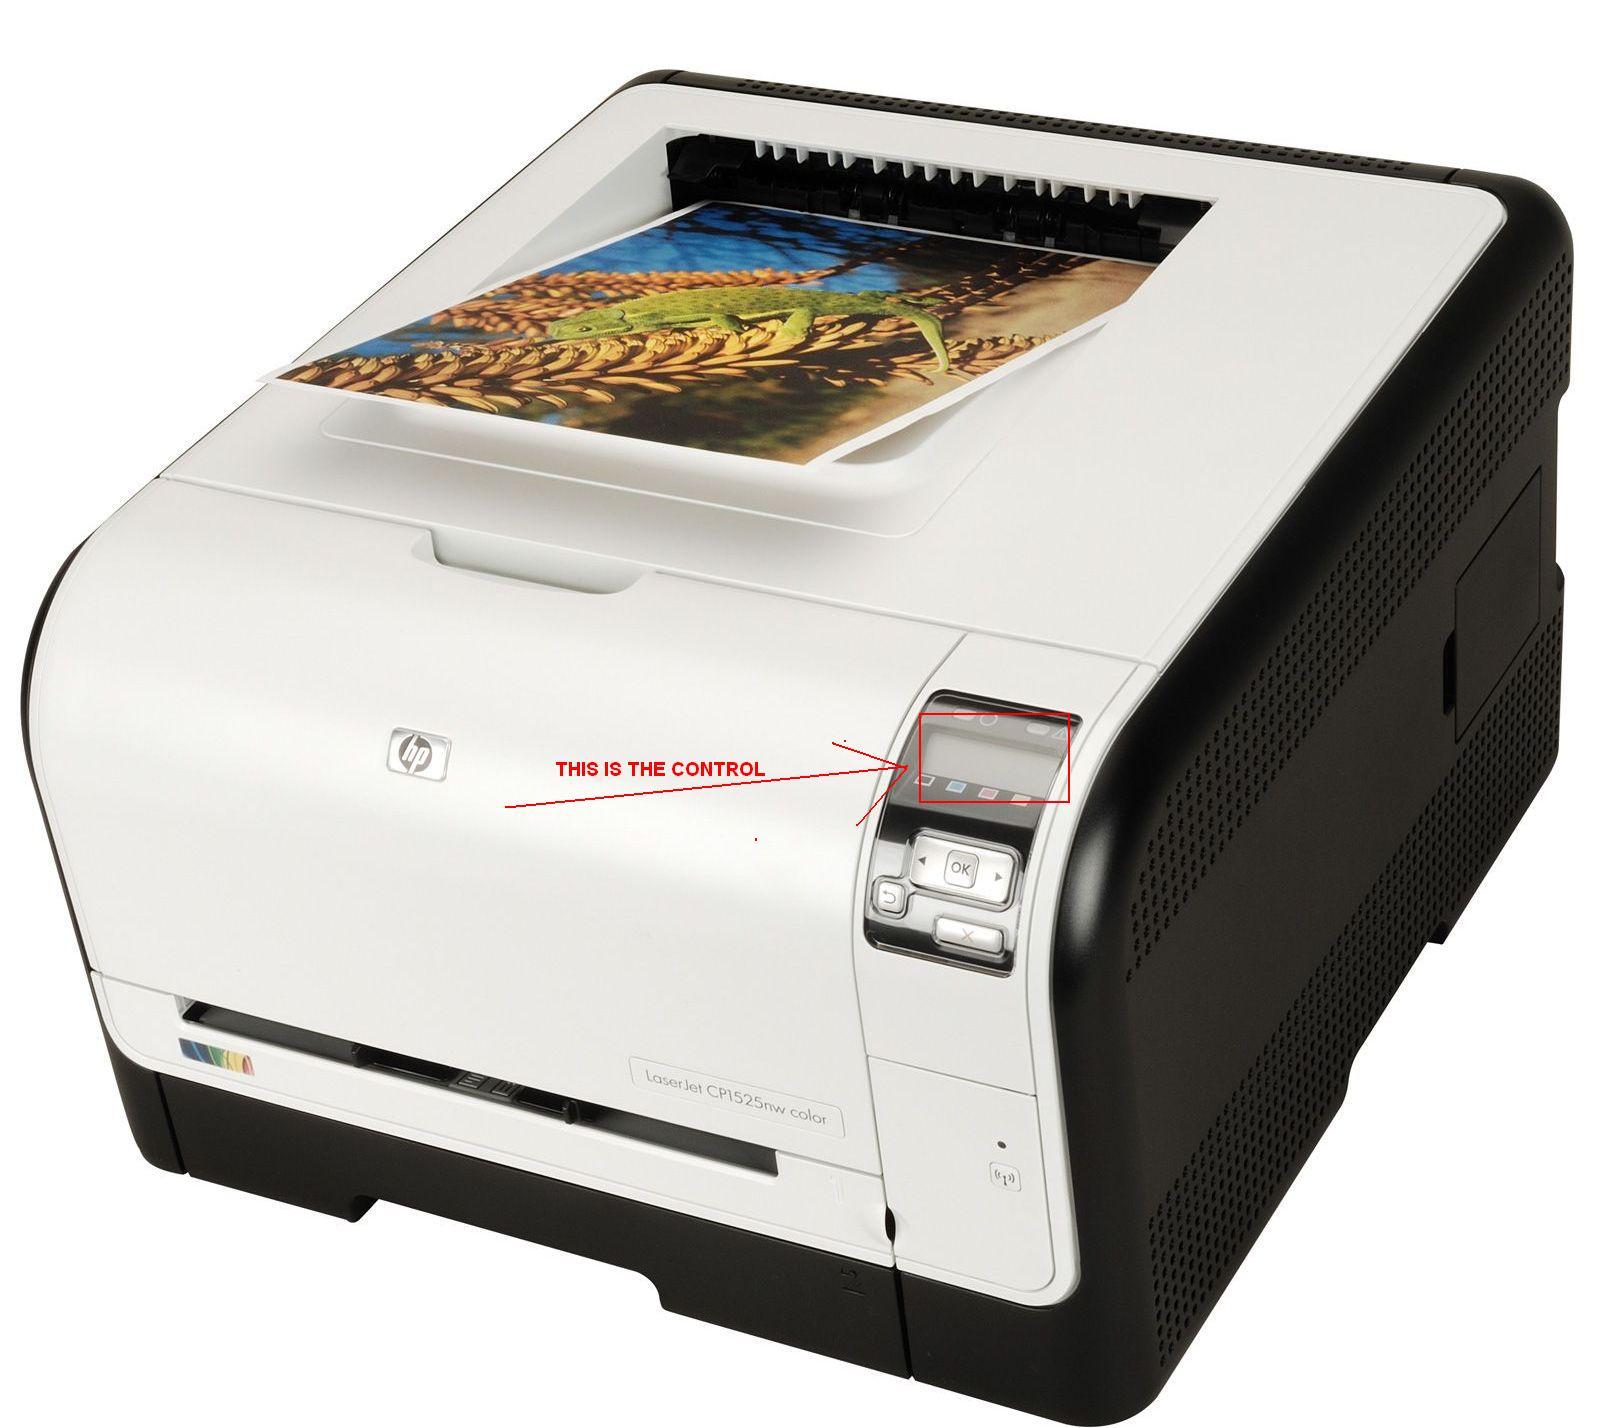 hp laserjet cp1525nw manual feed